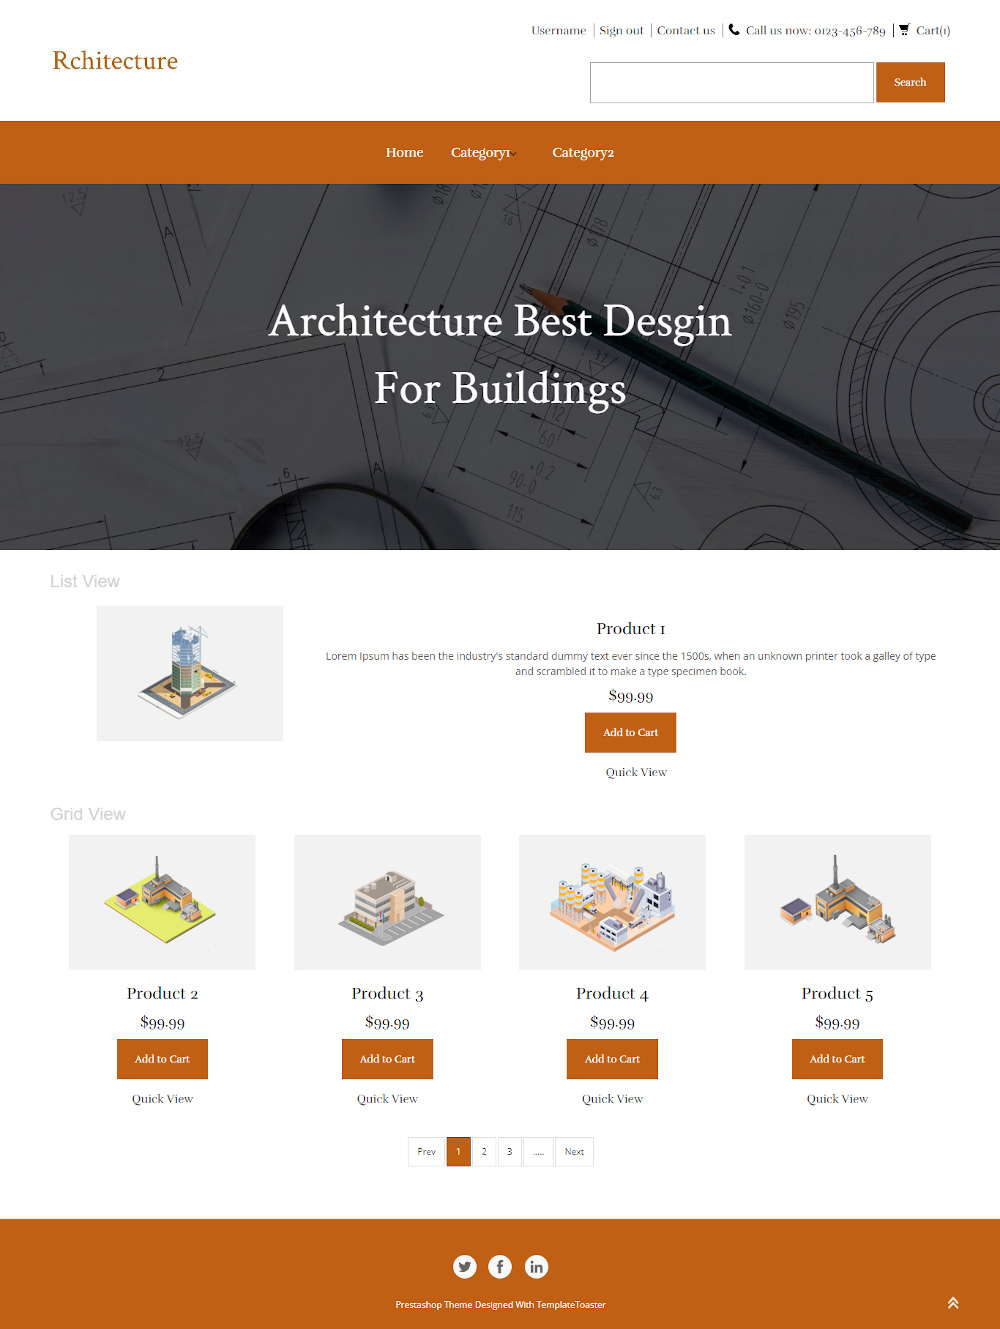 Rchitecture - Online Architecture Building Model Store PrestaShop Theme